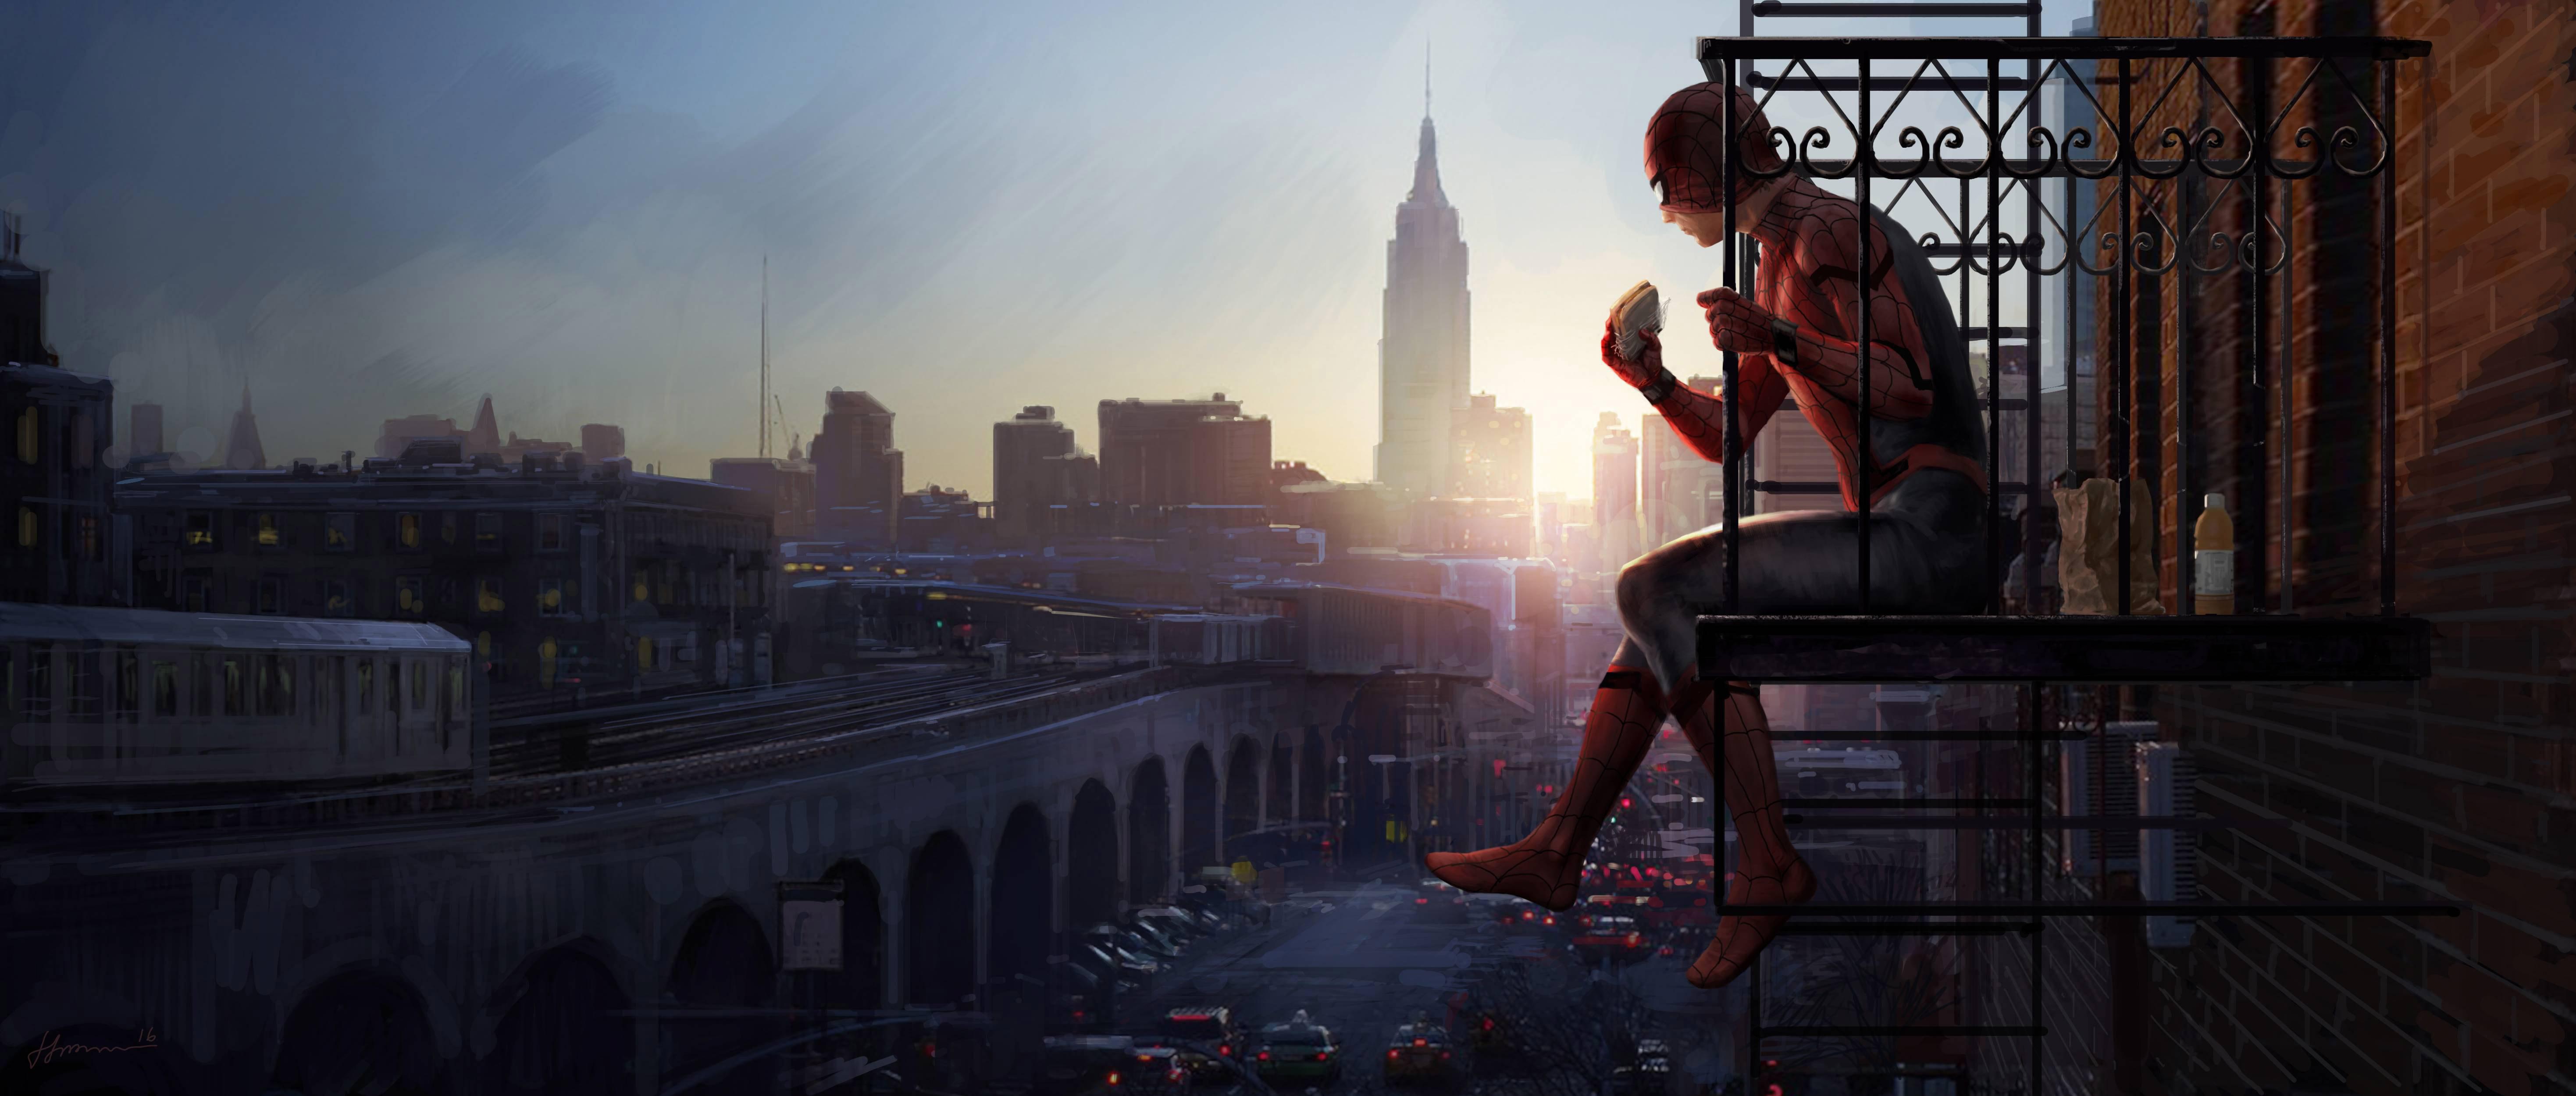 Spider Man Shattered Dimensions 4k Hd Desktop Wallpaper: Spiderman Homecoming Artwork 5k, HD Movies, 4k Wallpapers